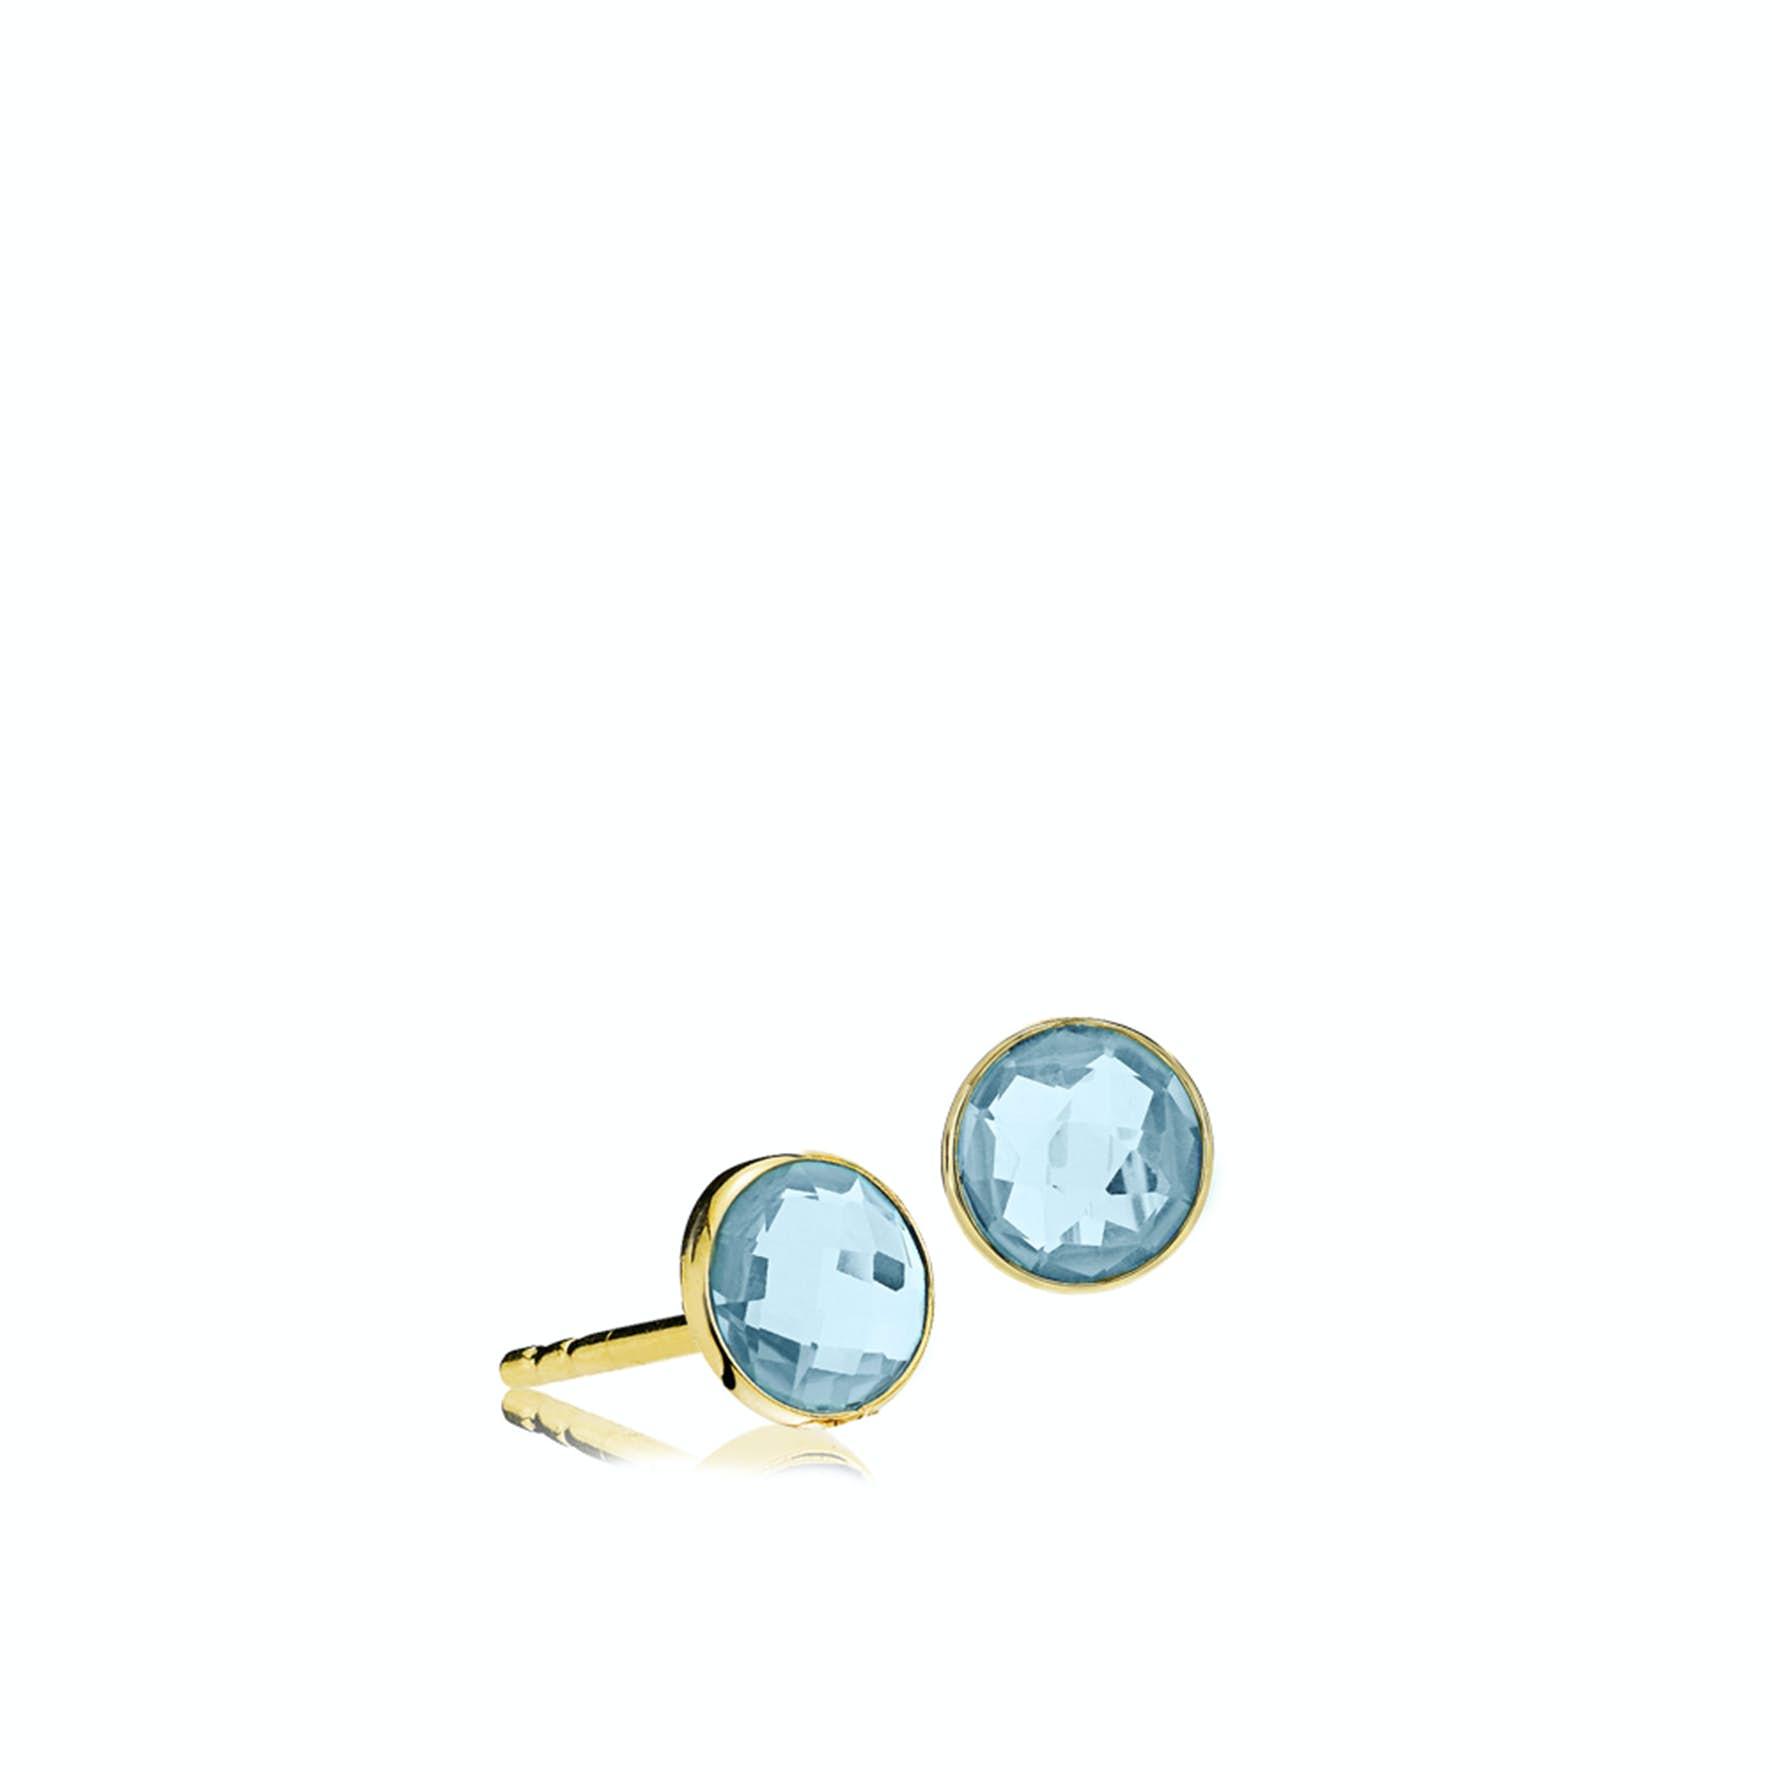 Prima Donna Earsticks Aqua Blue von Izabel Camille in Vergoldet-Silber Sterling 925|Aqua Blue